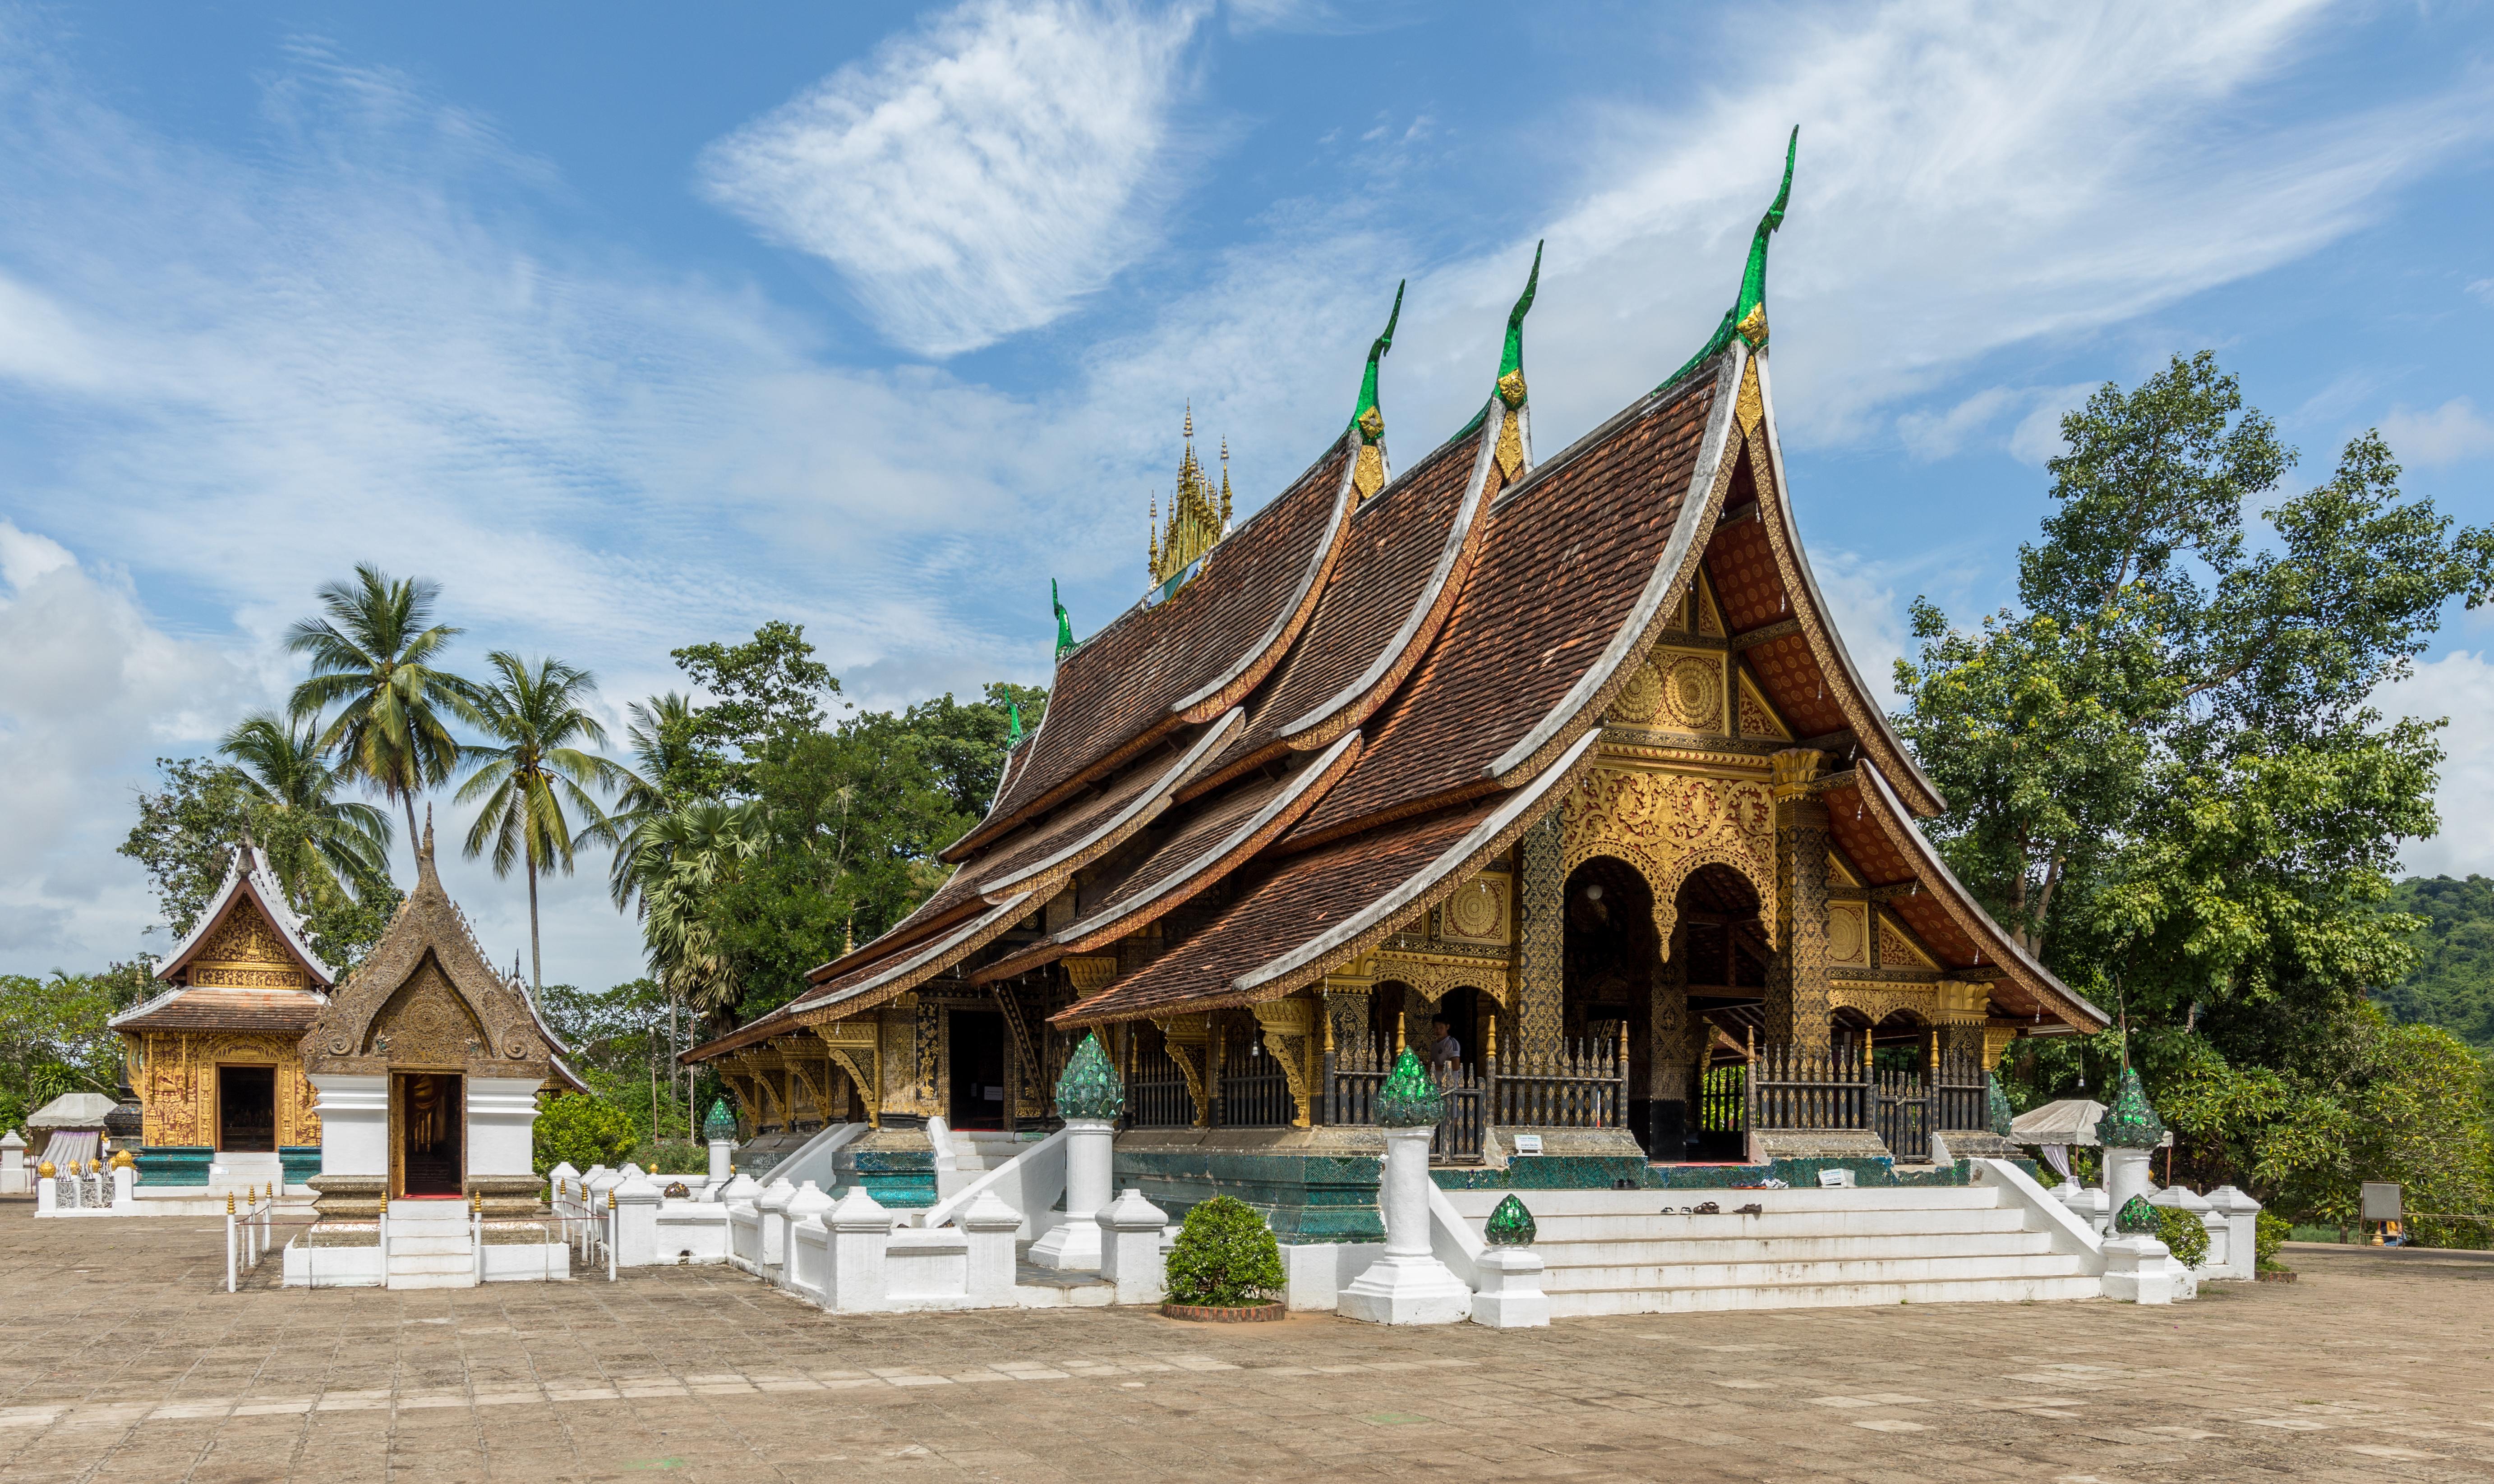 The Wat Xieng Thong: Why It's A Must-Visit Temple |Wat Xieng Thong Luang Prabang